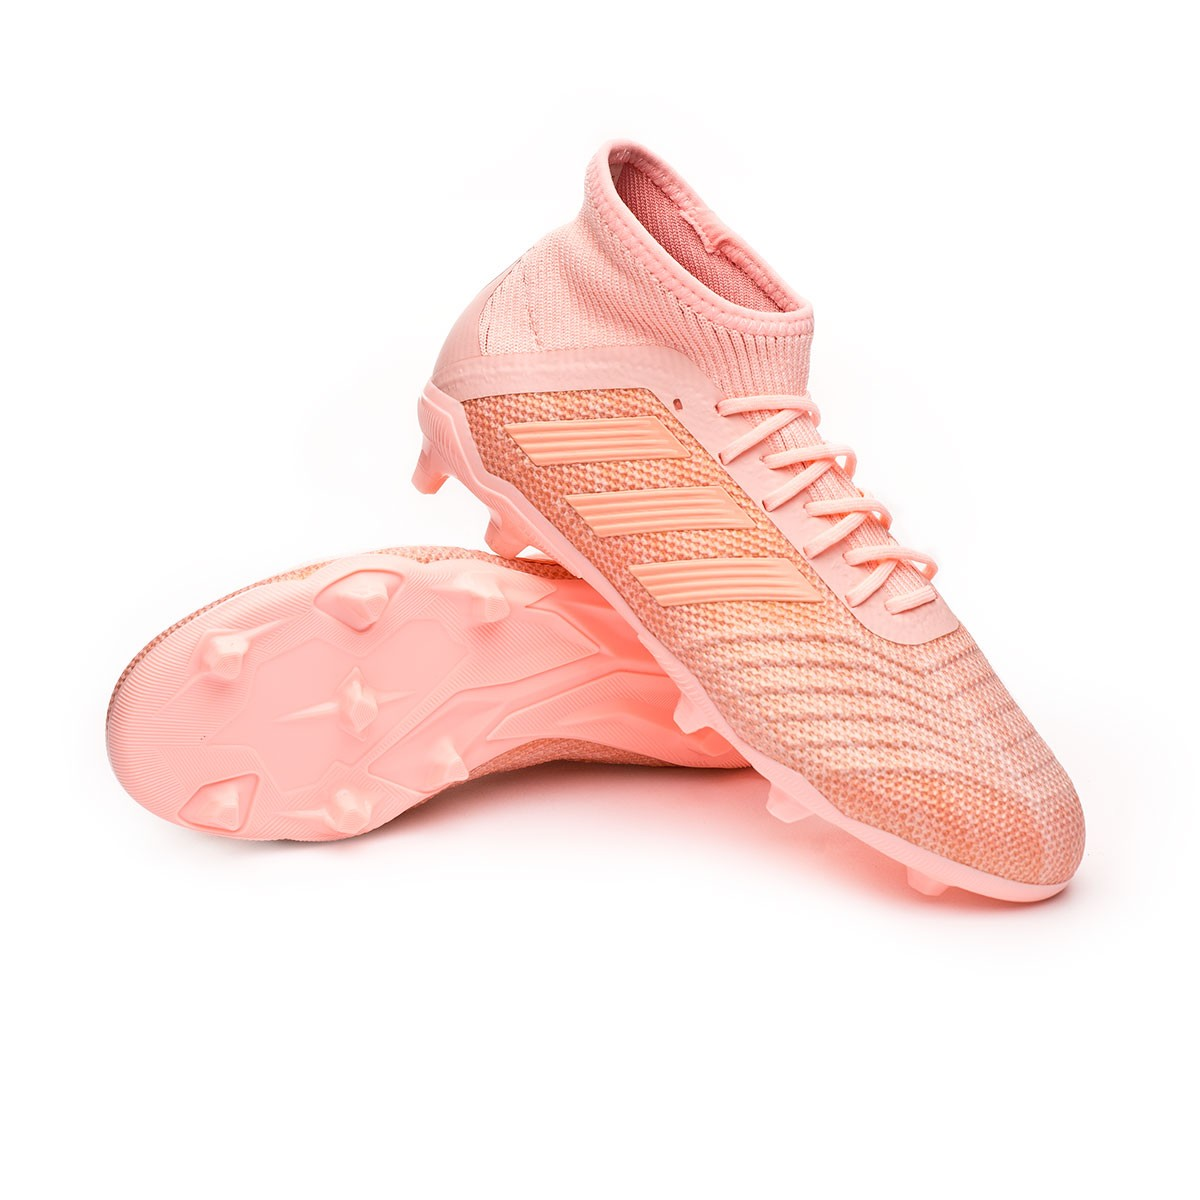 Boot adidas Kids Predator 18.1 FG Clear orange-Trace pink - Leaked ... 2ef93dabef452